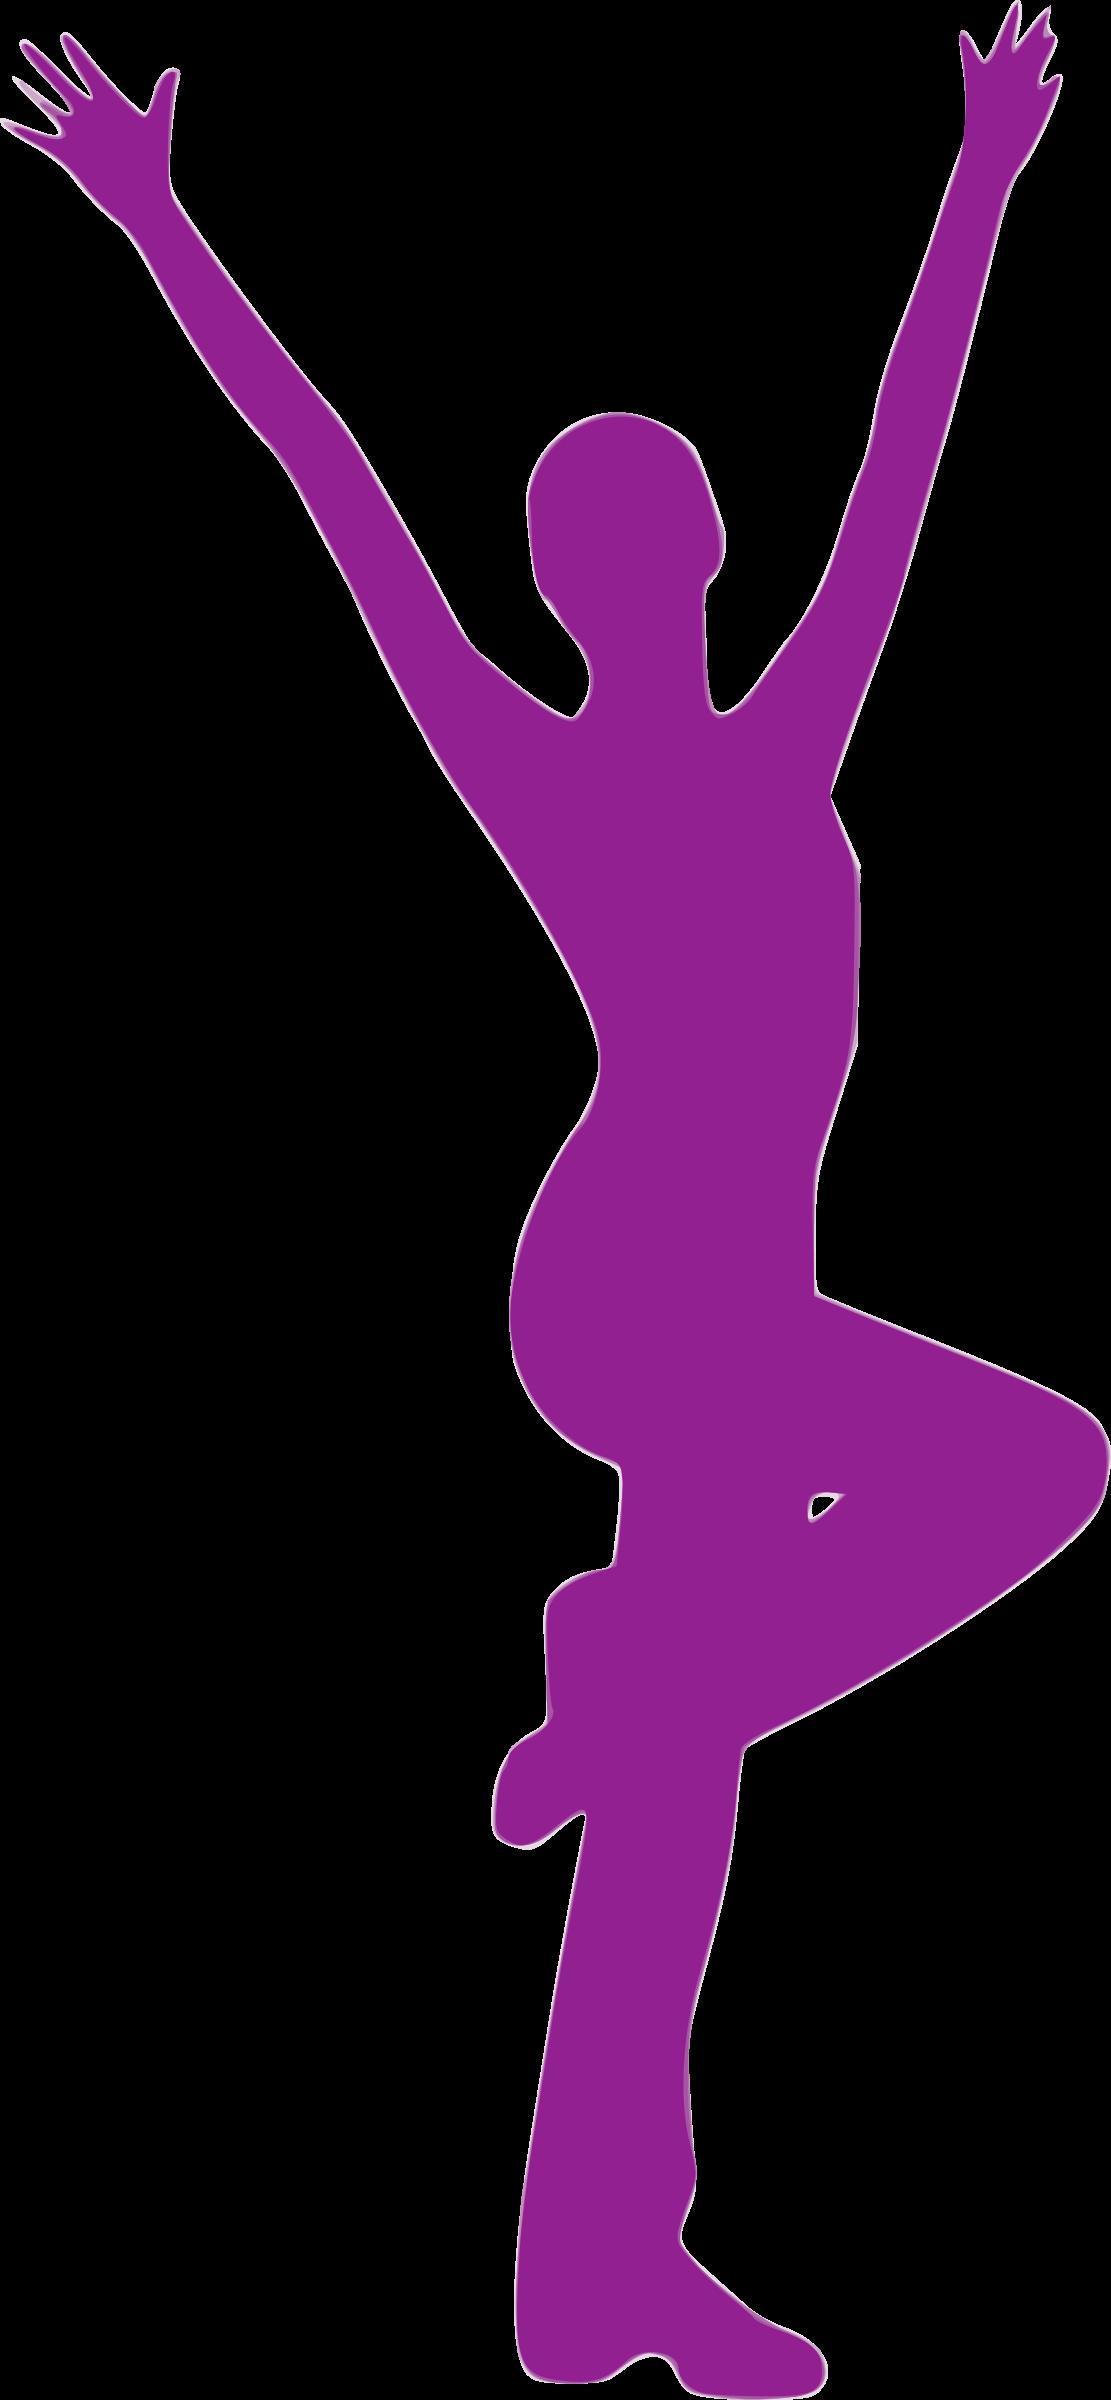 Danse clipart silhouette Silhouette Silhouette Danse Clipart 45